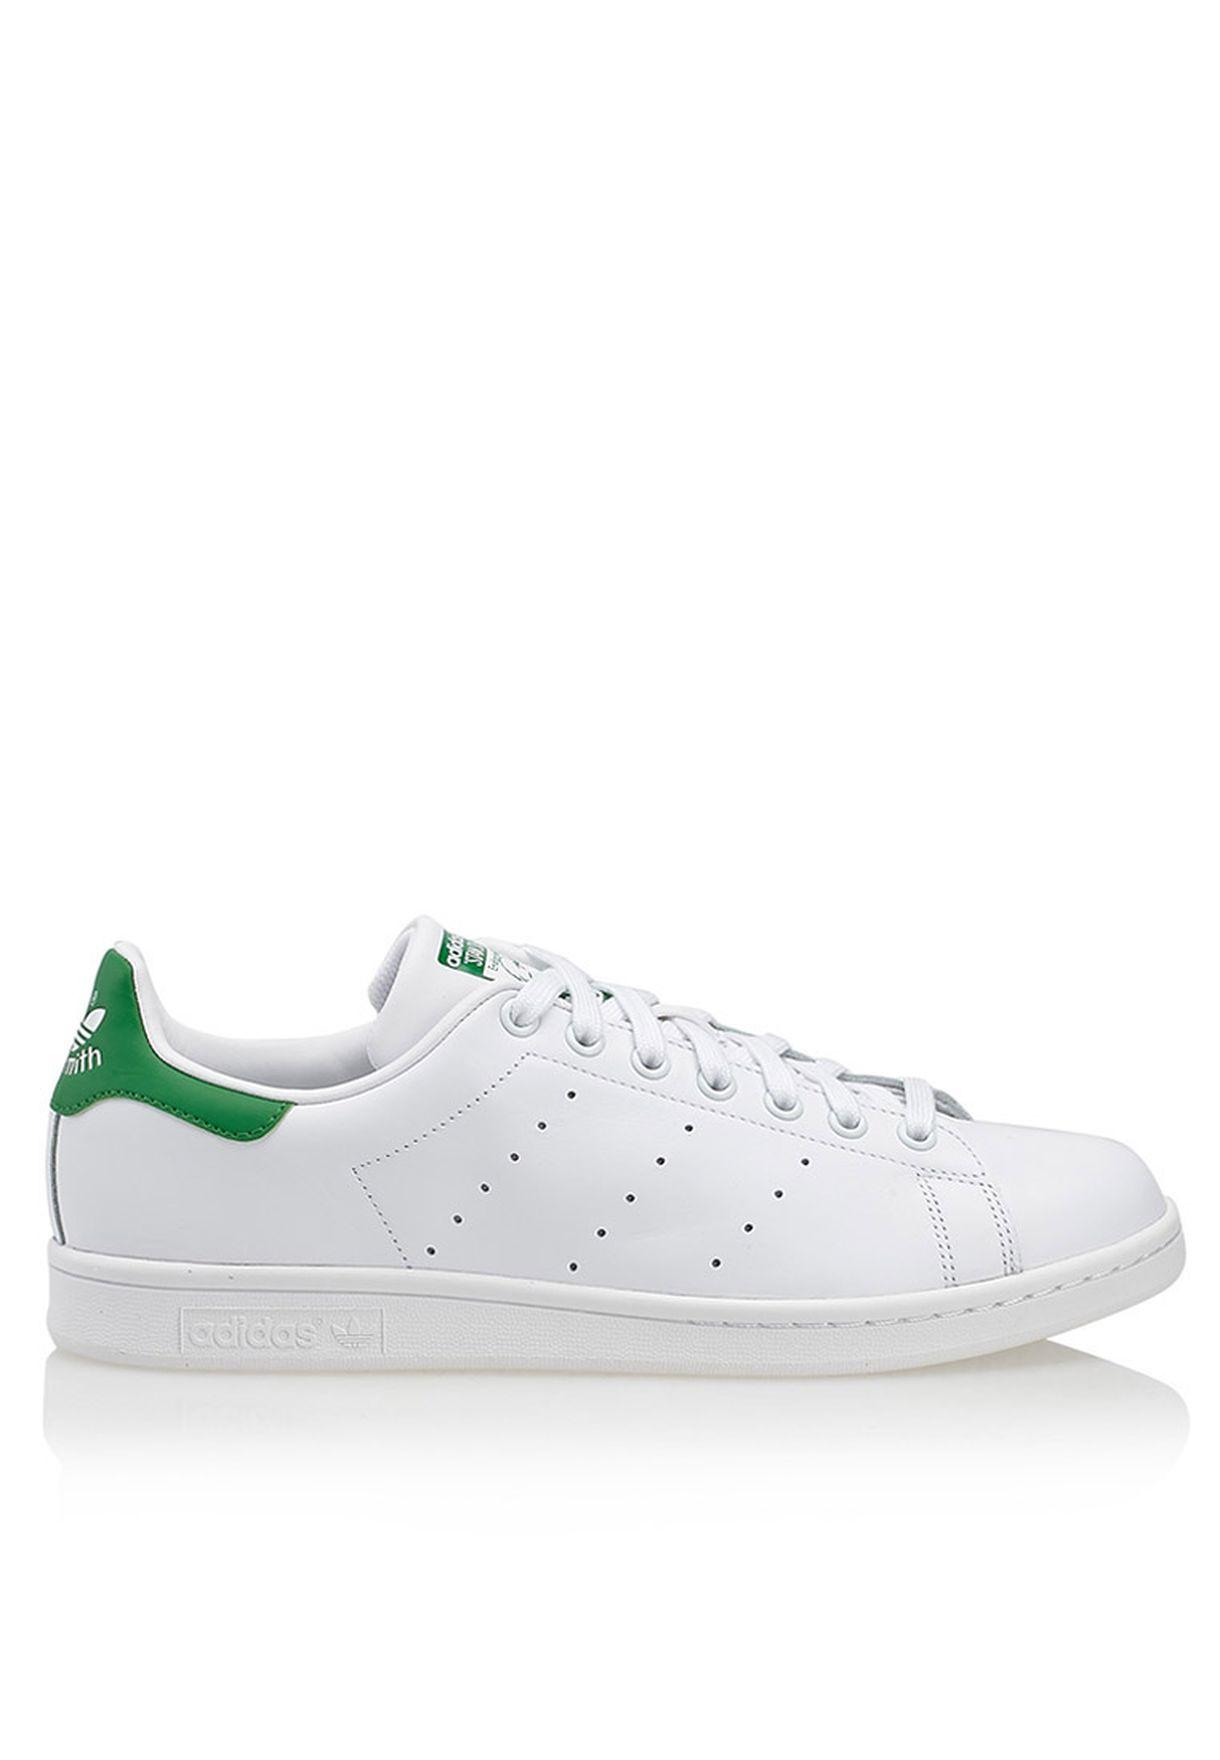 Shop adidas Originals white Stan Smith M20324 for Men in Qatar ... 37d03179f